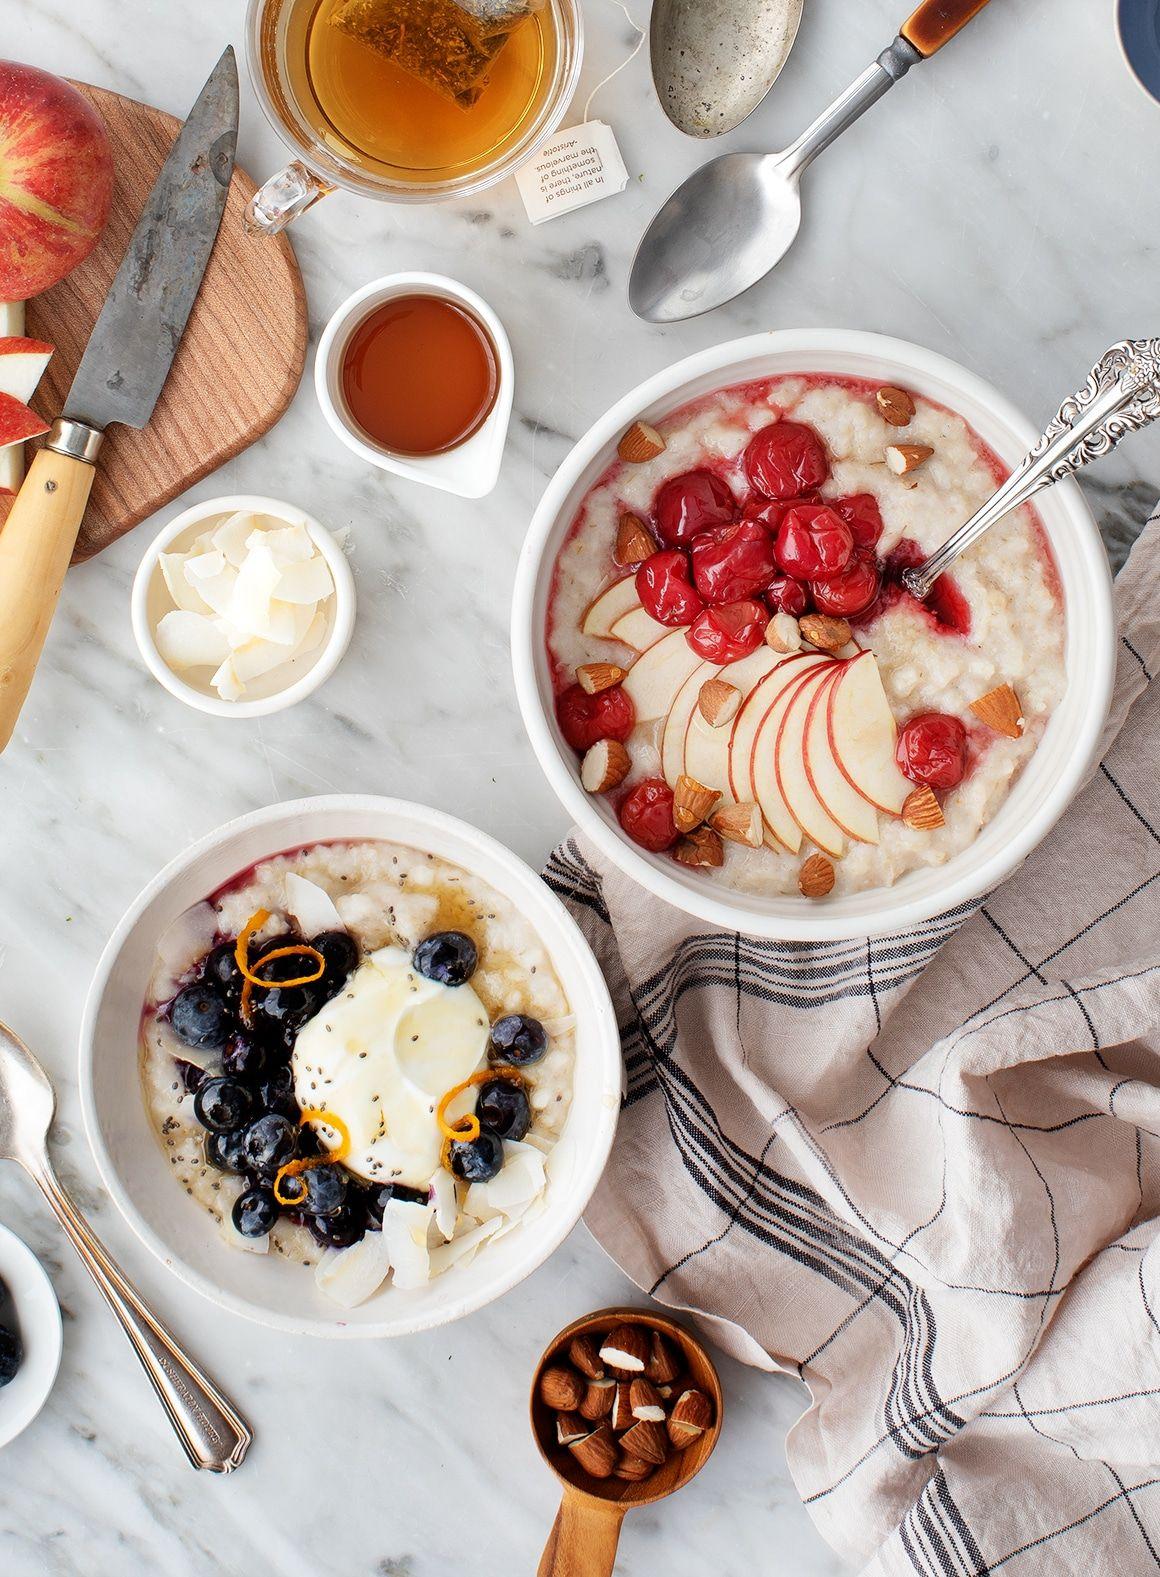 How To Make Oatmeal Recipe Love And Lemons Recipe Oatmeal Recipes Oatmeal Toppings Oats Recipes Breakfast